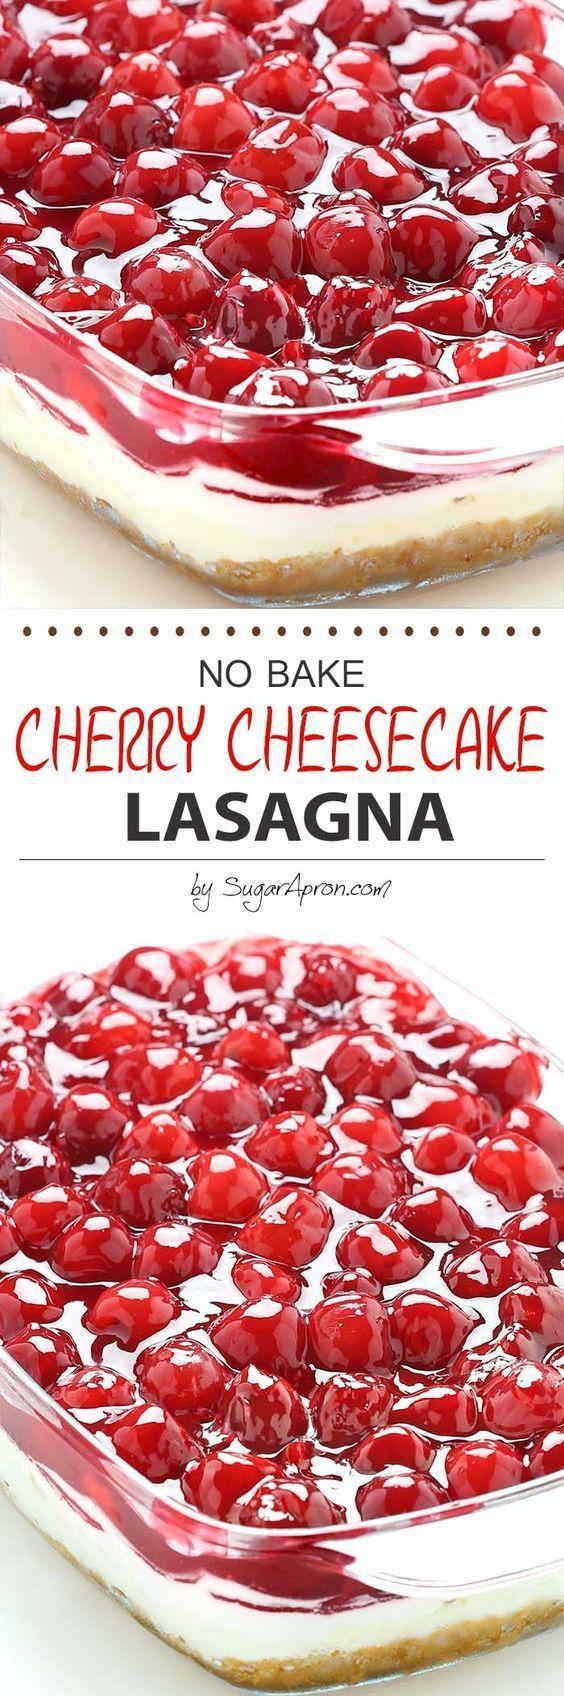 No+Bake+Cherry+Cheesecake+Dessert+Lasagna+Recipe+via+Sugar+Apron+-+Dessert+lasagna+with+graham+cracker+crust,+cream+cheese+filling,+pecans+and+cherry+pie+topping.+